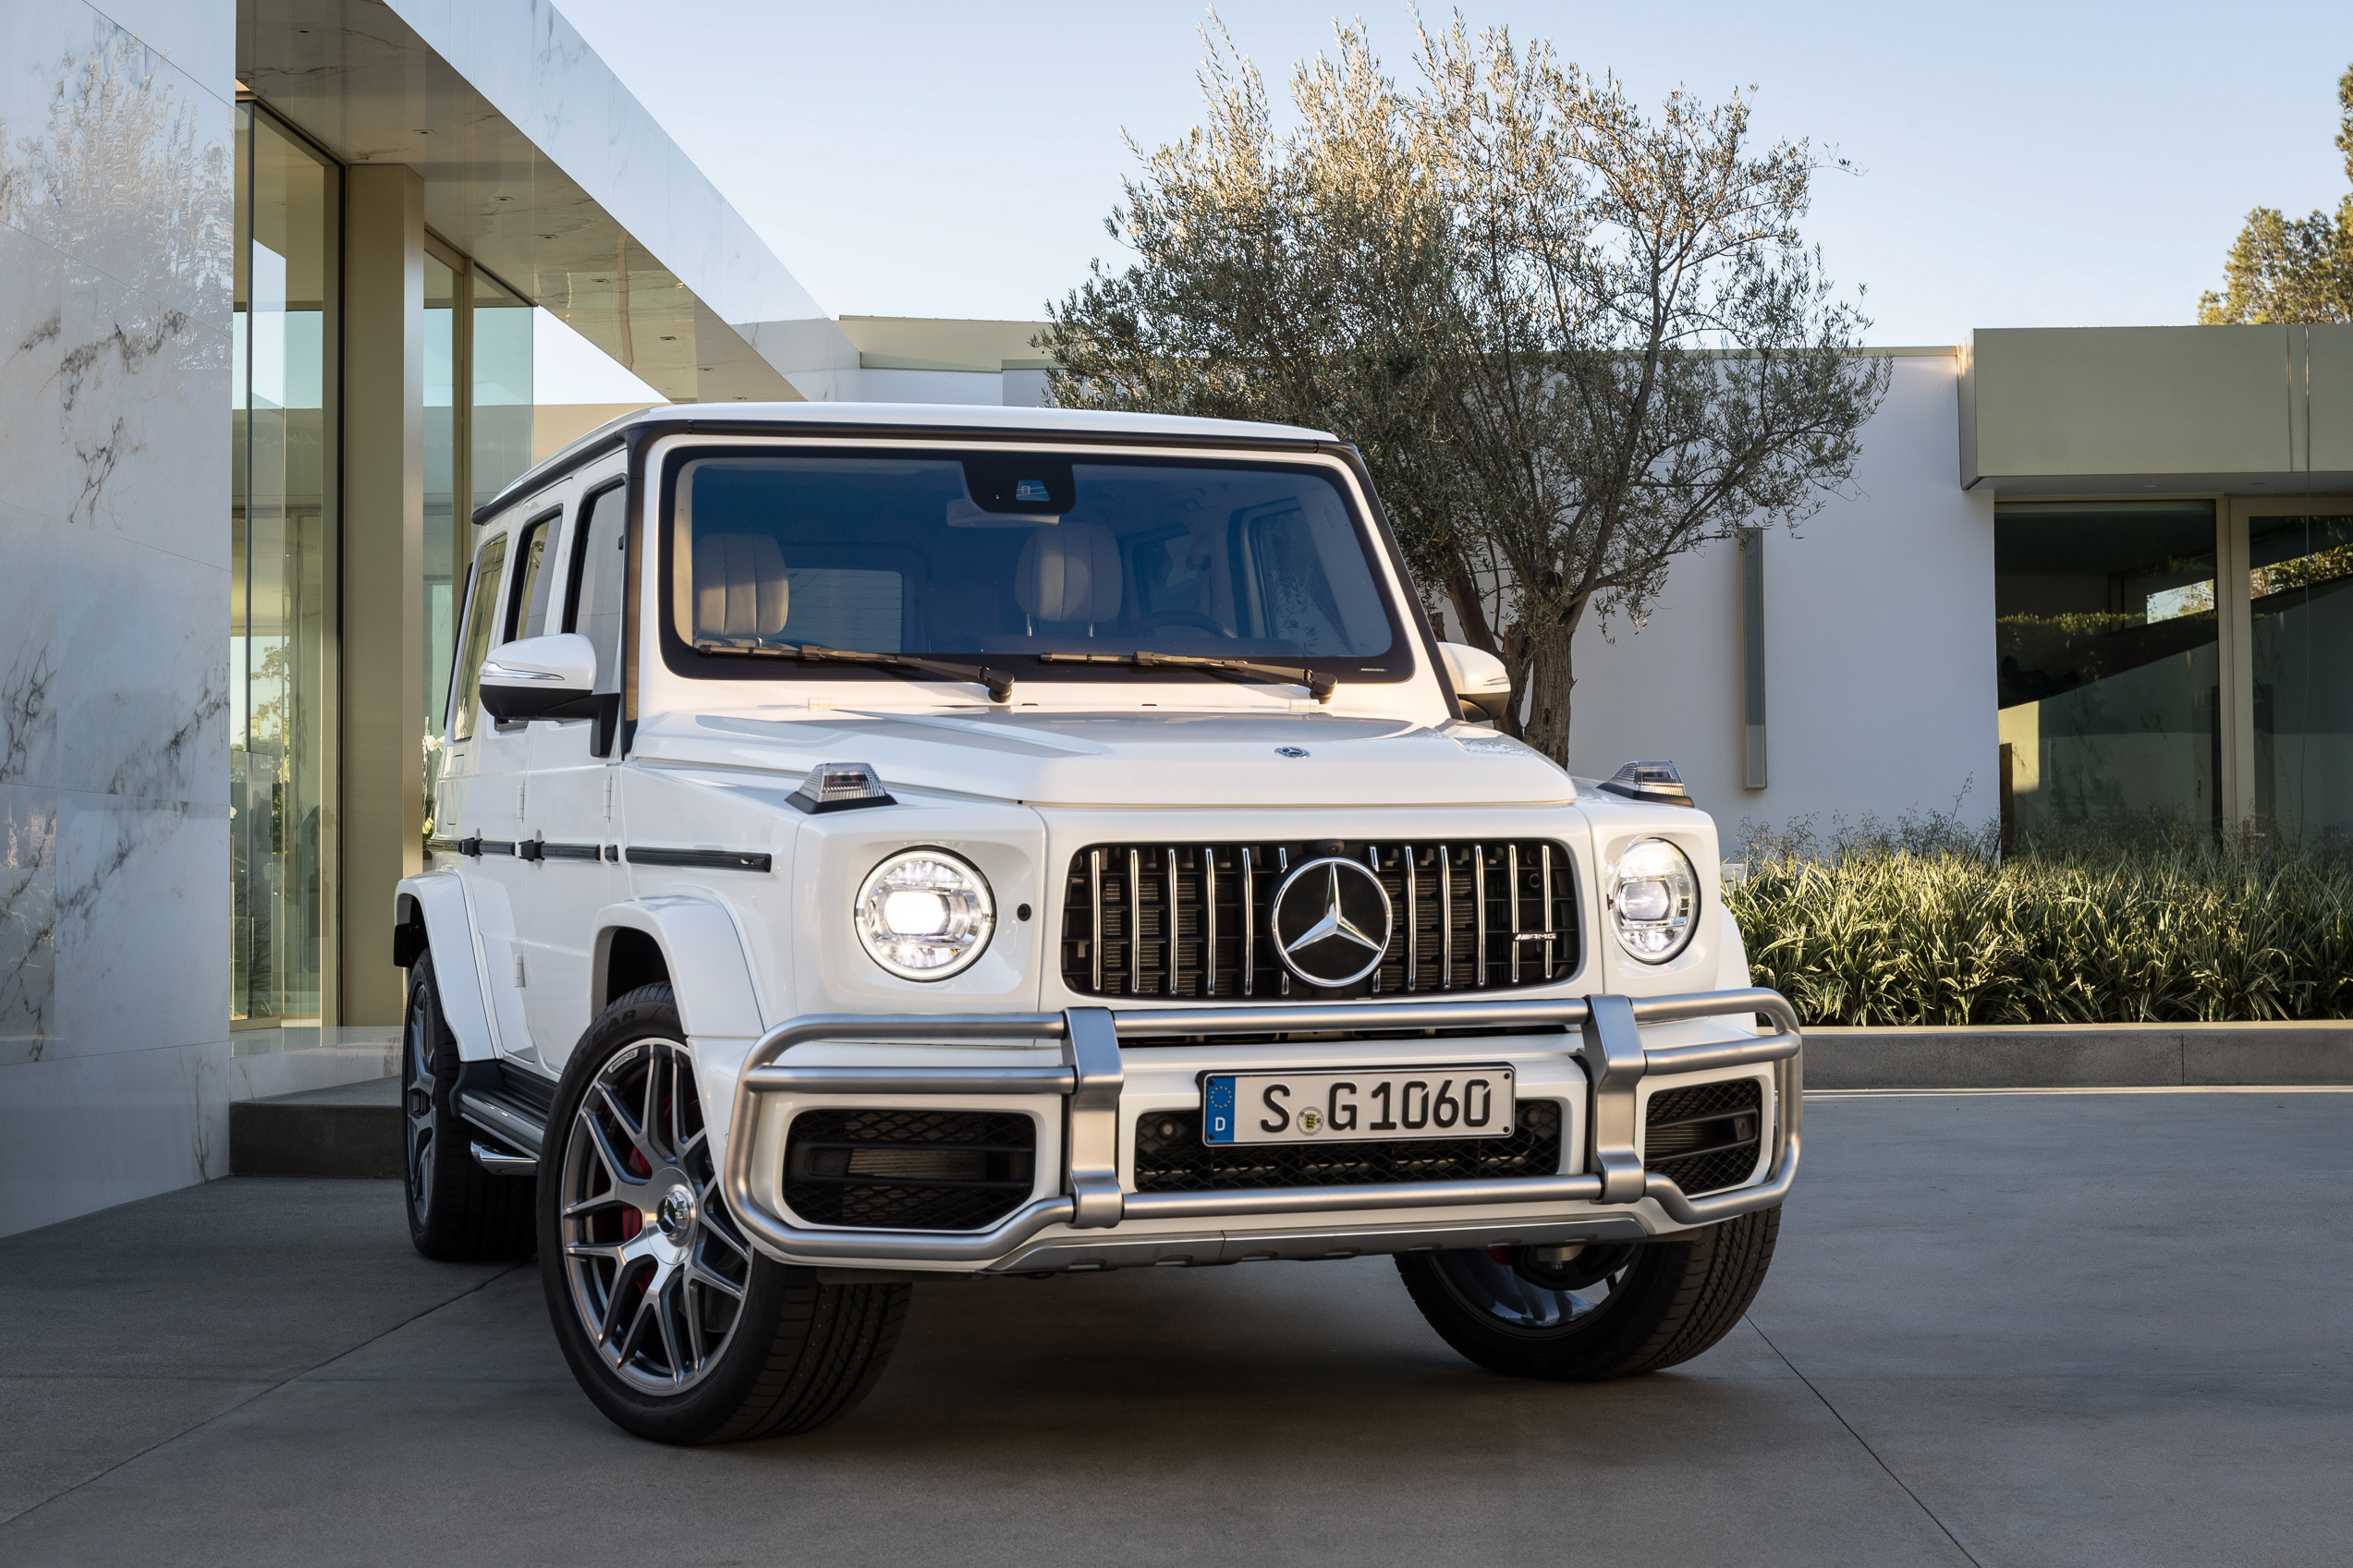 Mercedes G63 2018 >> Mercedes-AMG G63 2019 – 4.0L V8, 585 hp, 850 Nm Image 778971